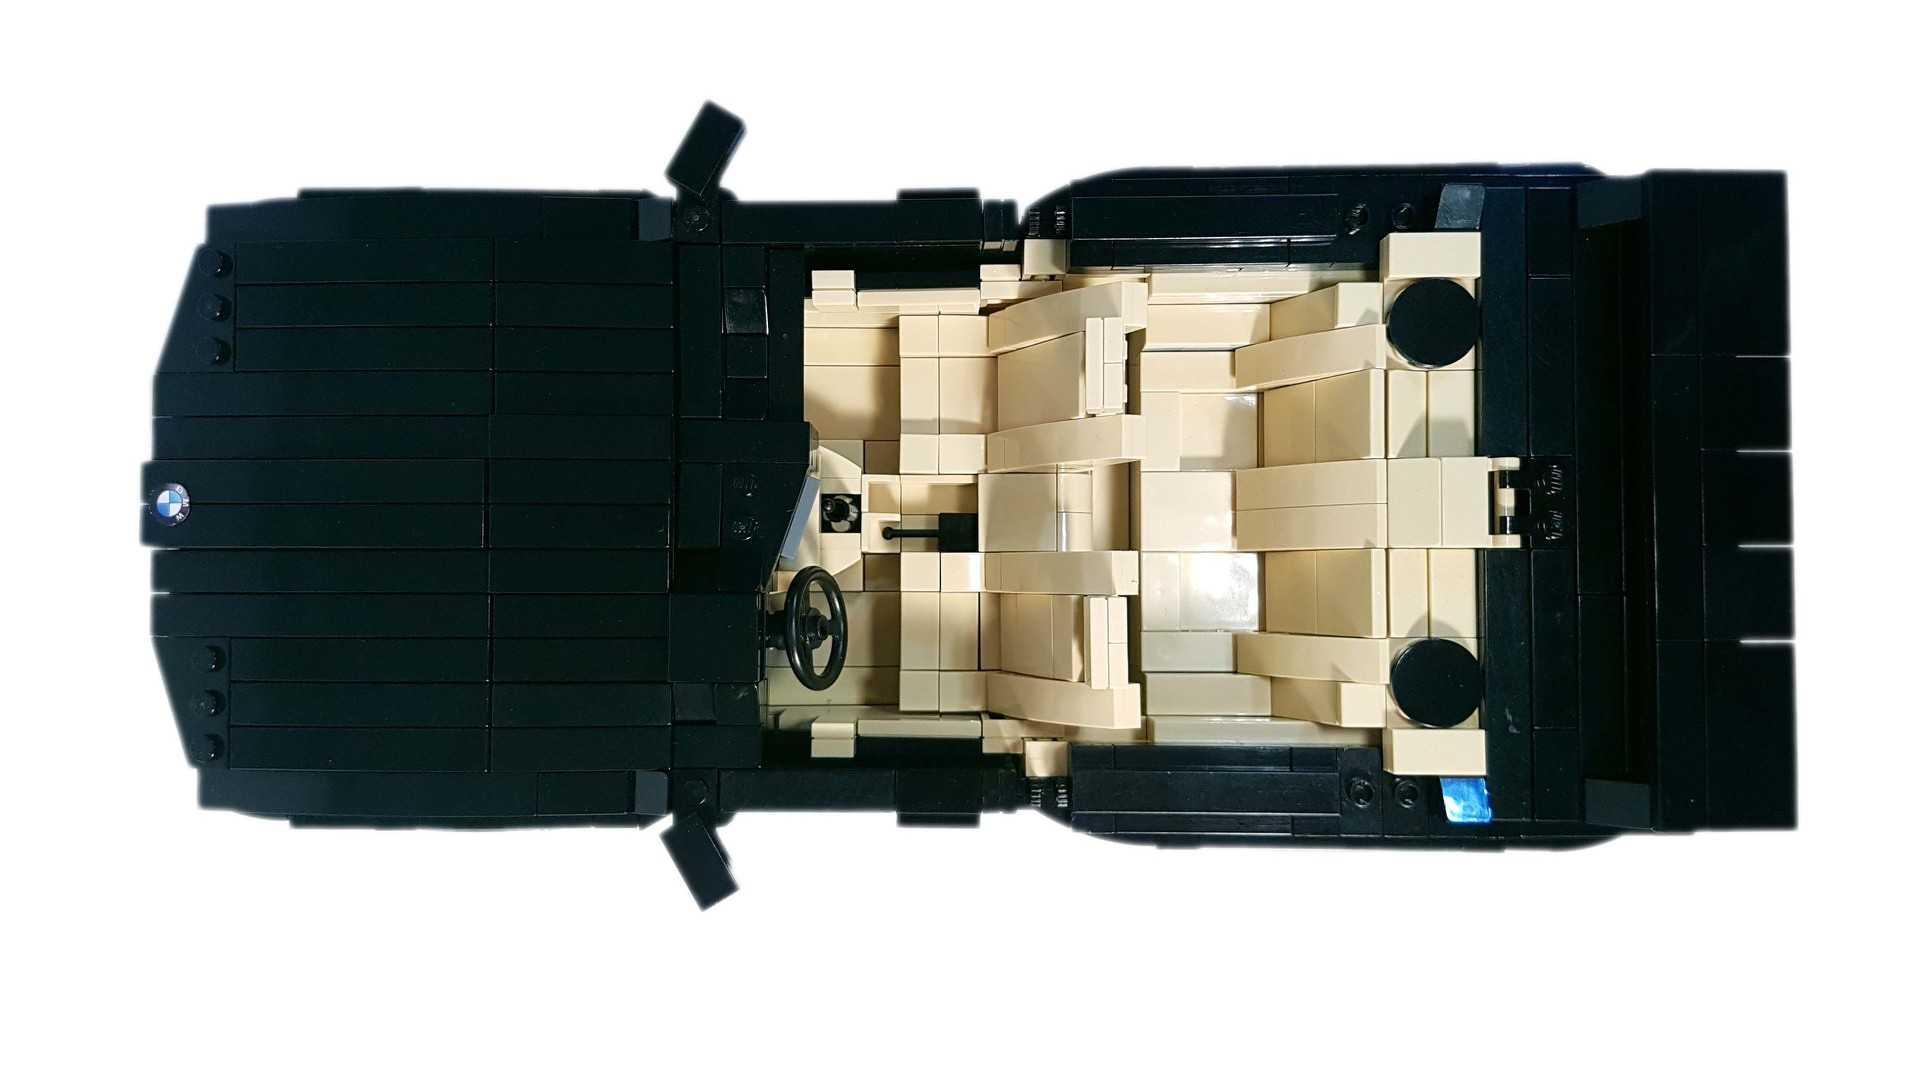 BMW E30 M3 Lego Ideas (31)